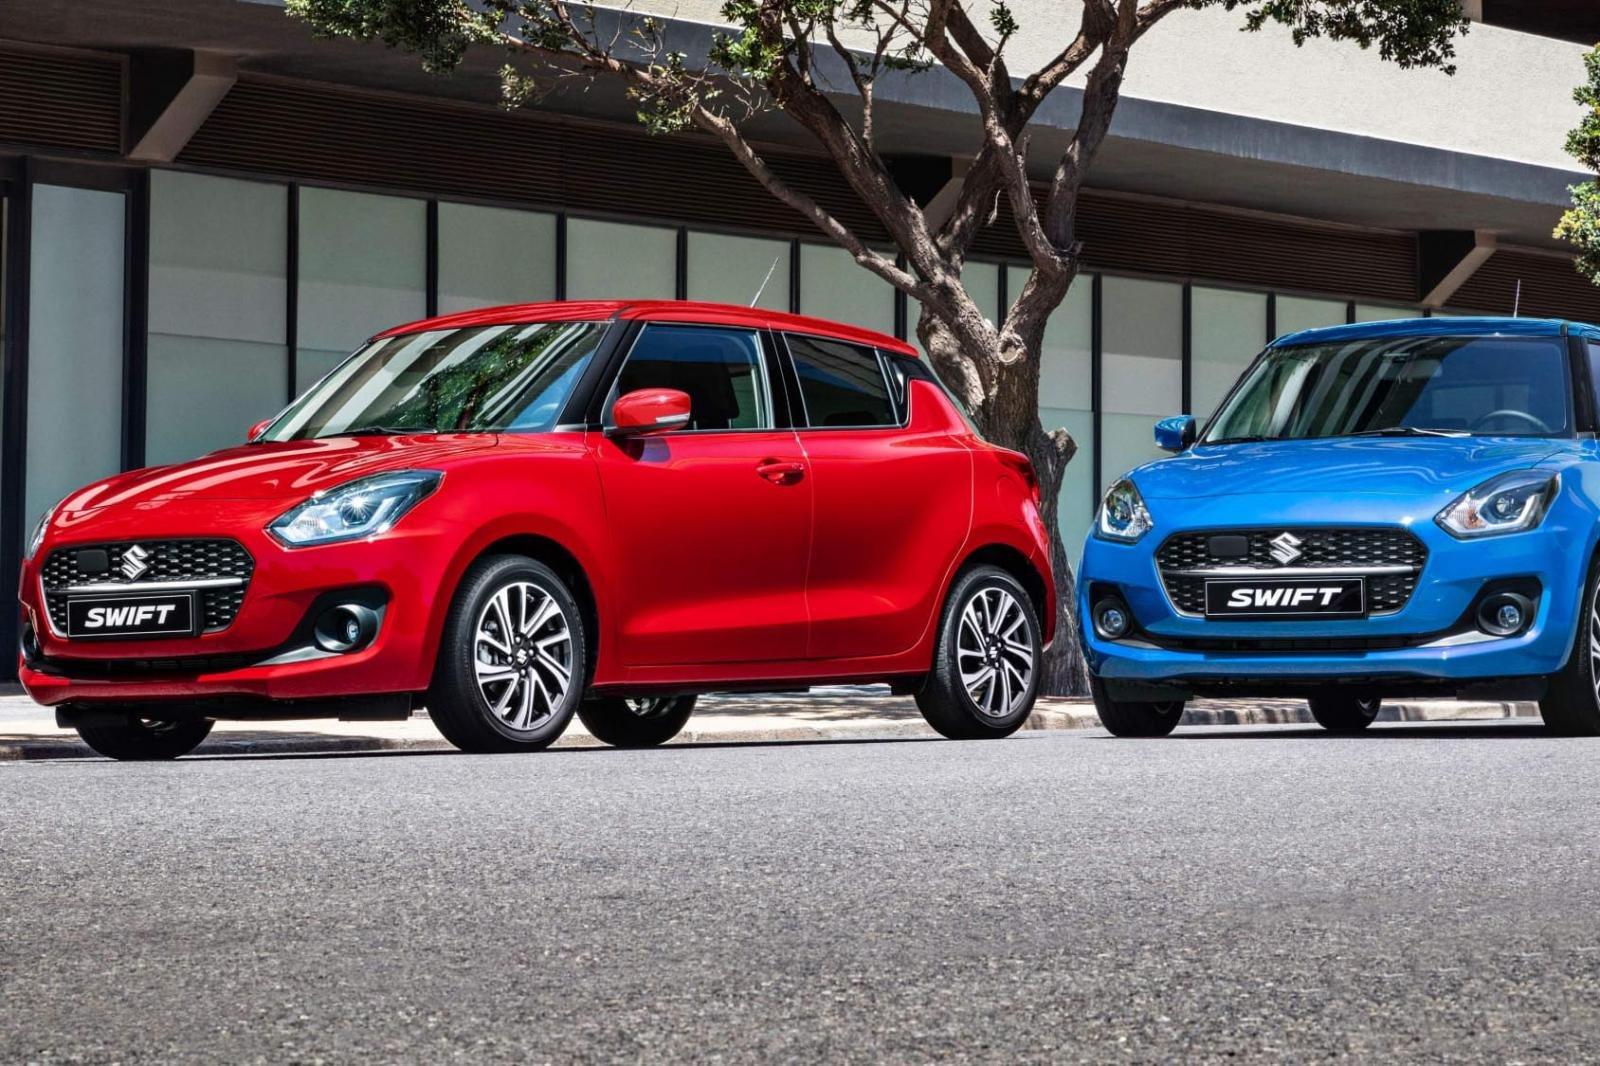 Đánh giá xe Suzuki Swift 2021 mới.